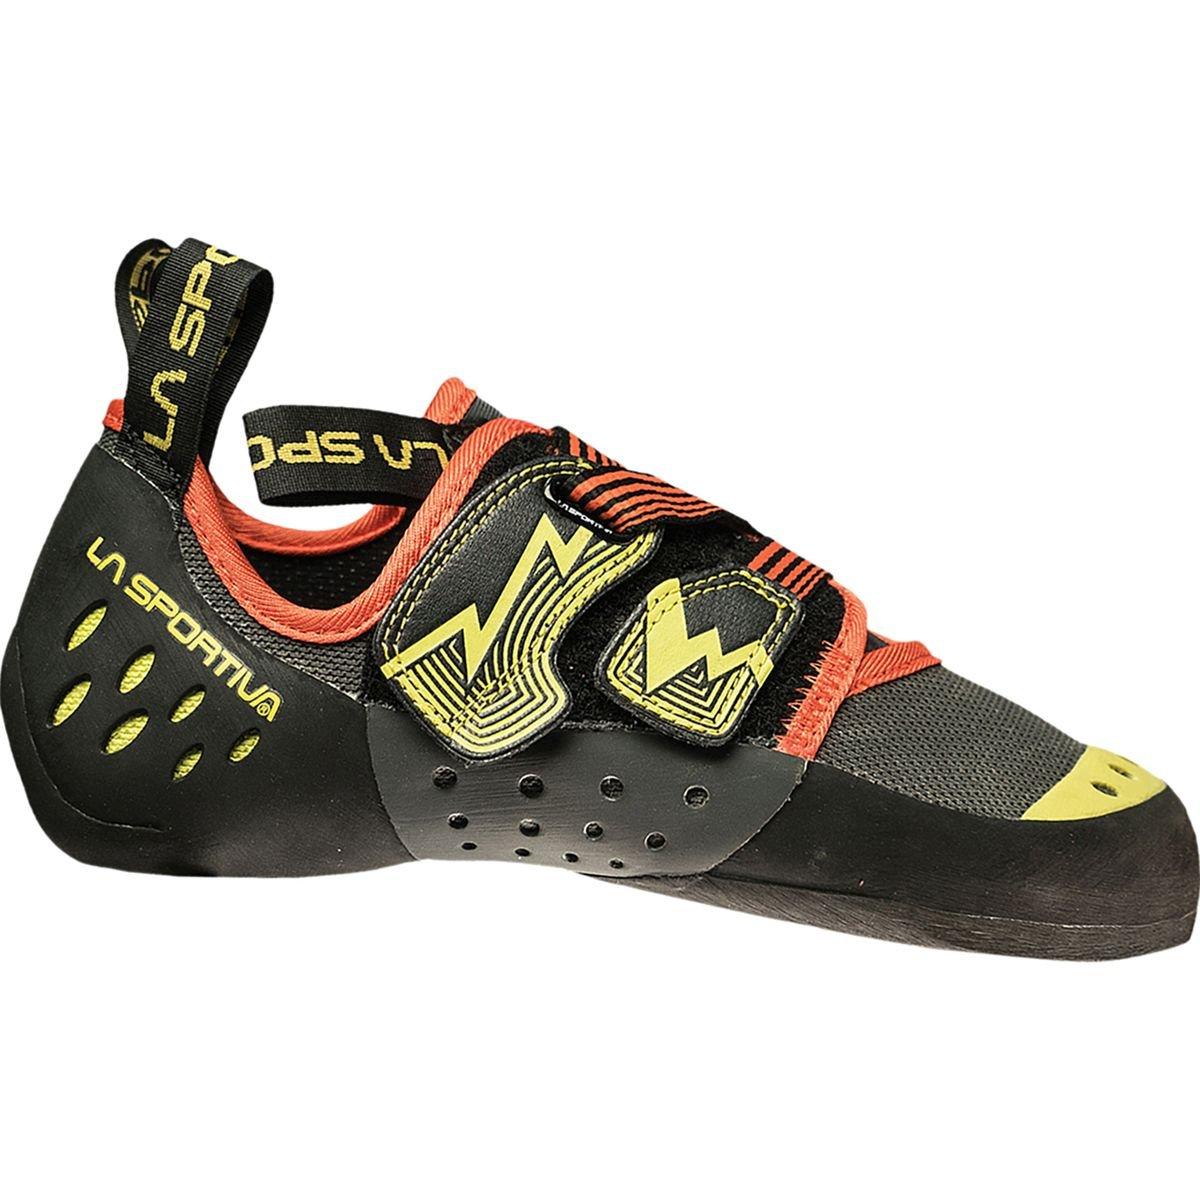 La Sportiva OXYGYM Climbing Shoe, Carbon/Sulphur, 33